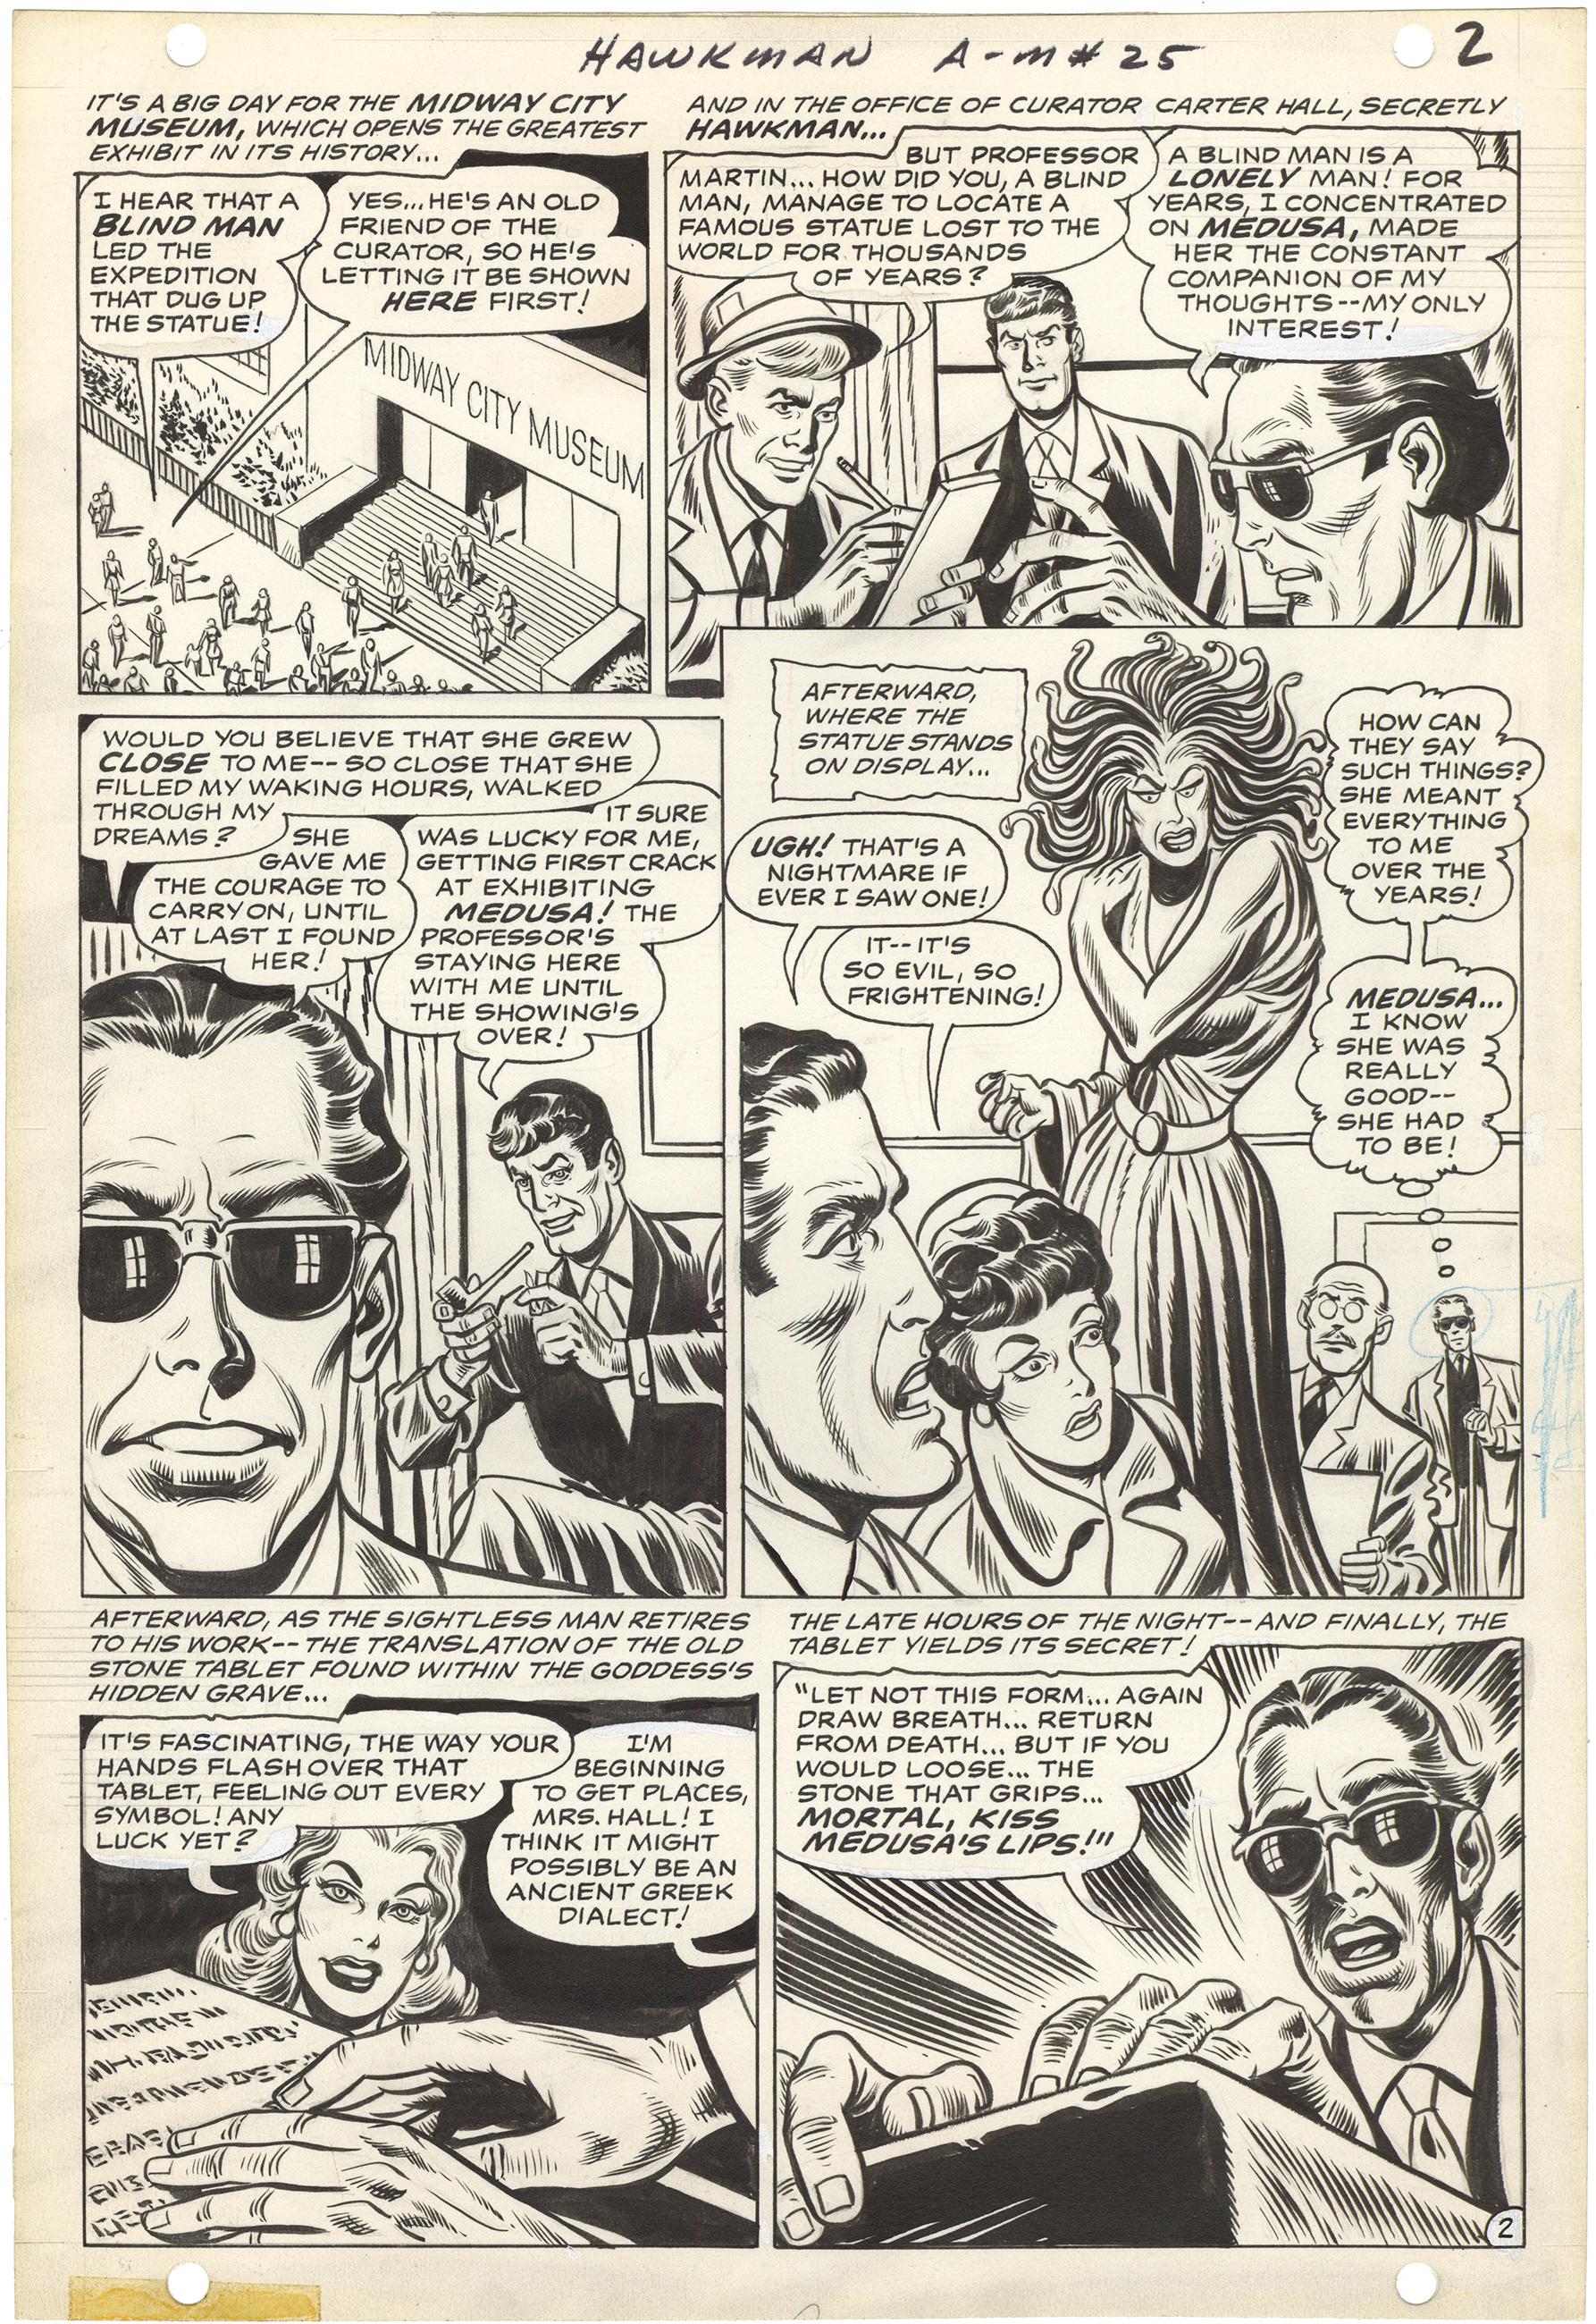 Hawkman #25 p2